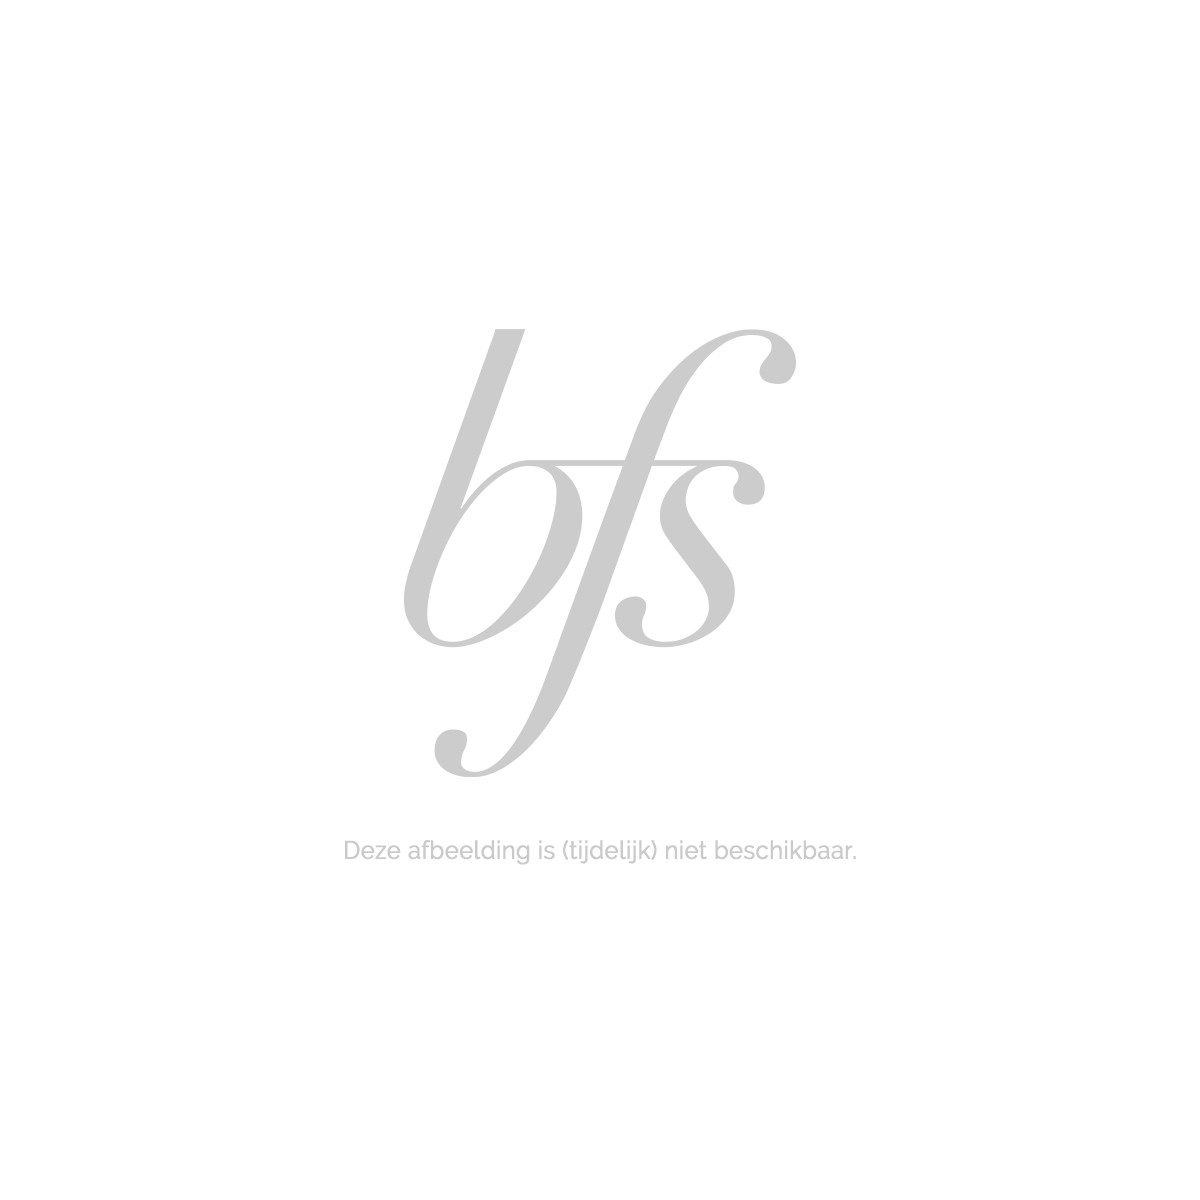 Christian Dior Diorskin Nude Skin-Glowing Makeup Spf15 30 Ml